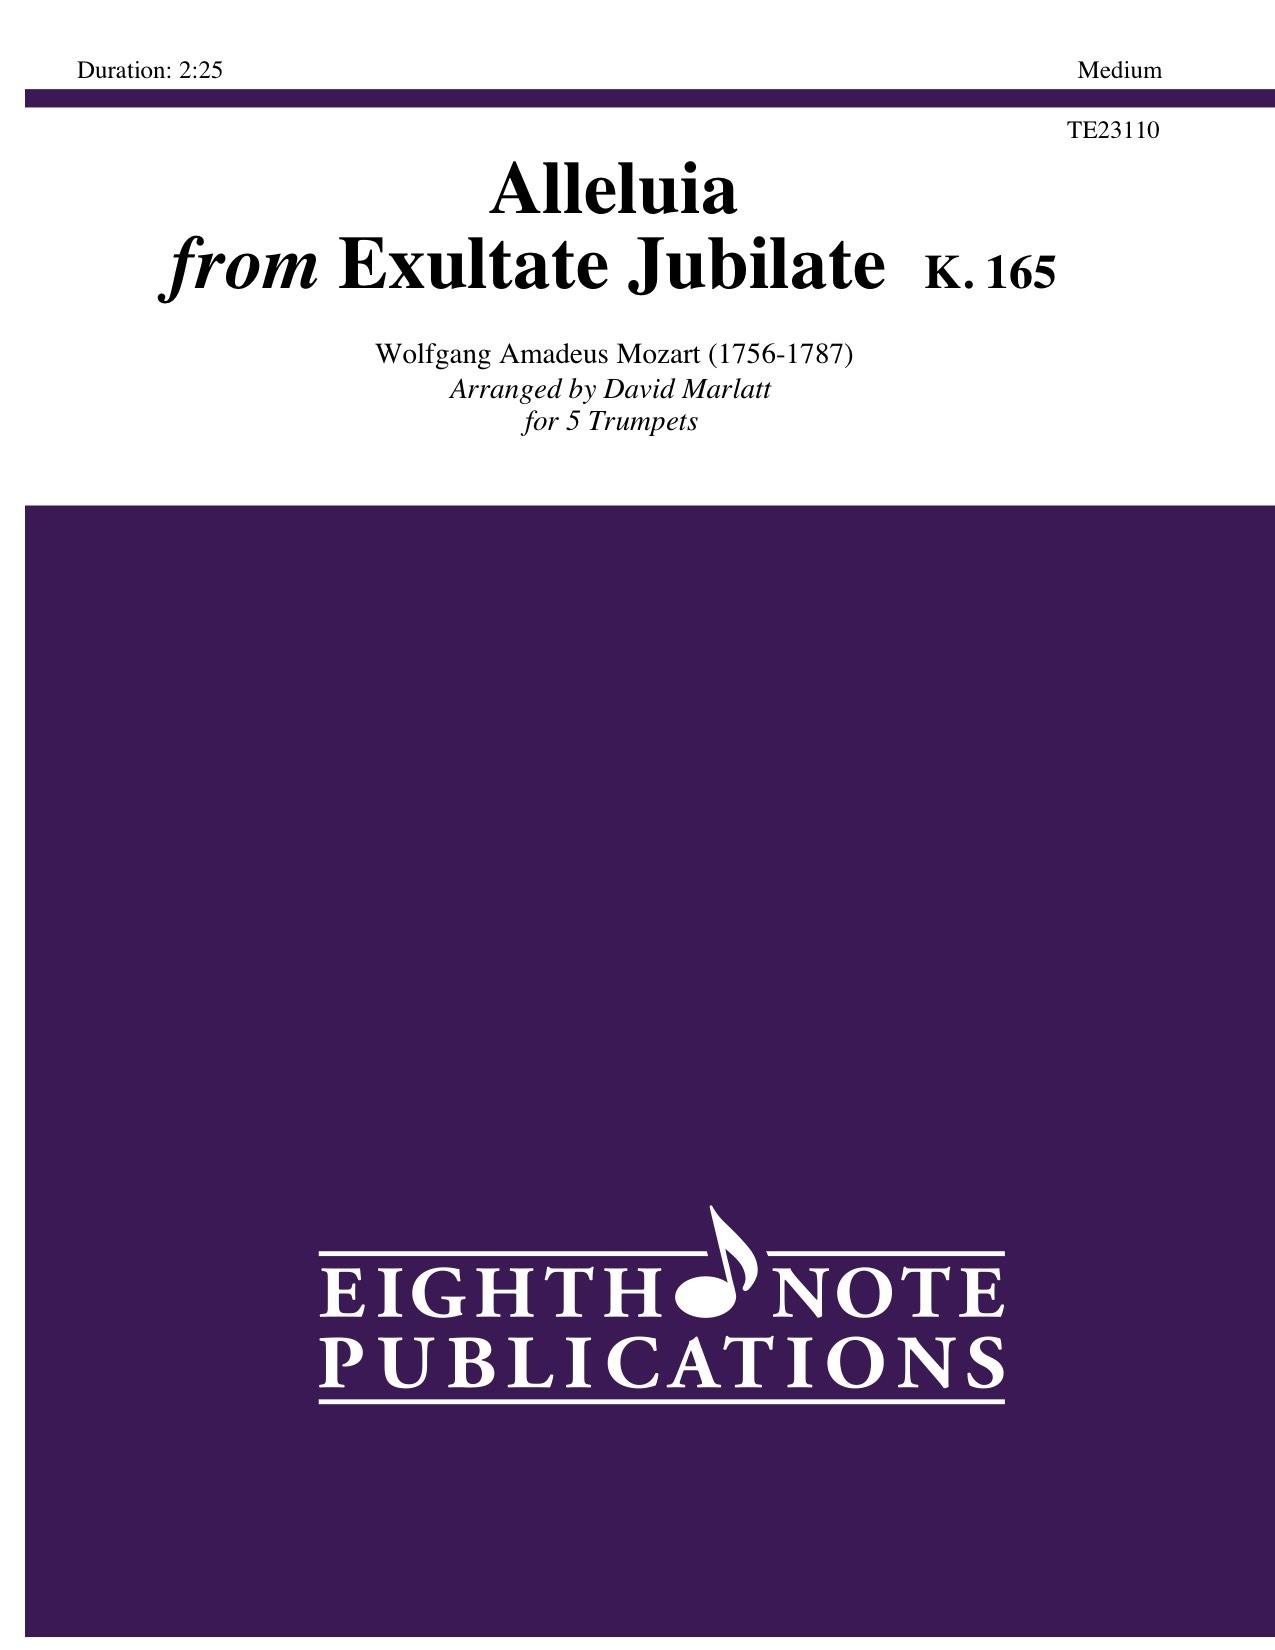 Alleluia from Exultate Jubilate K. 165  - Wolfgang Amadeus Mozart